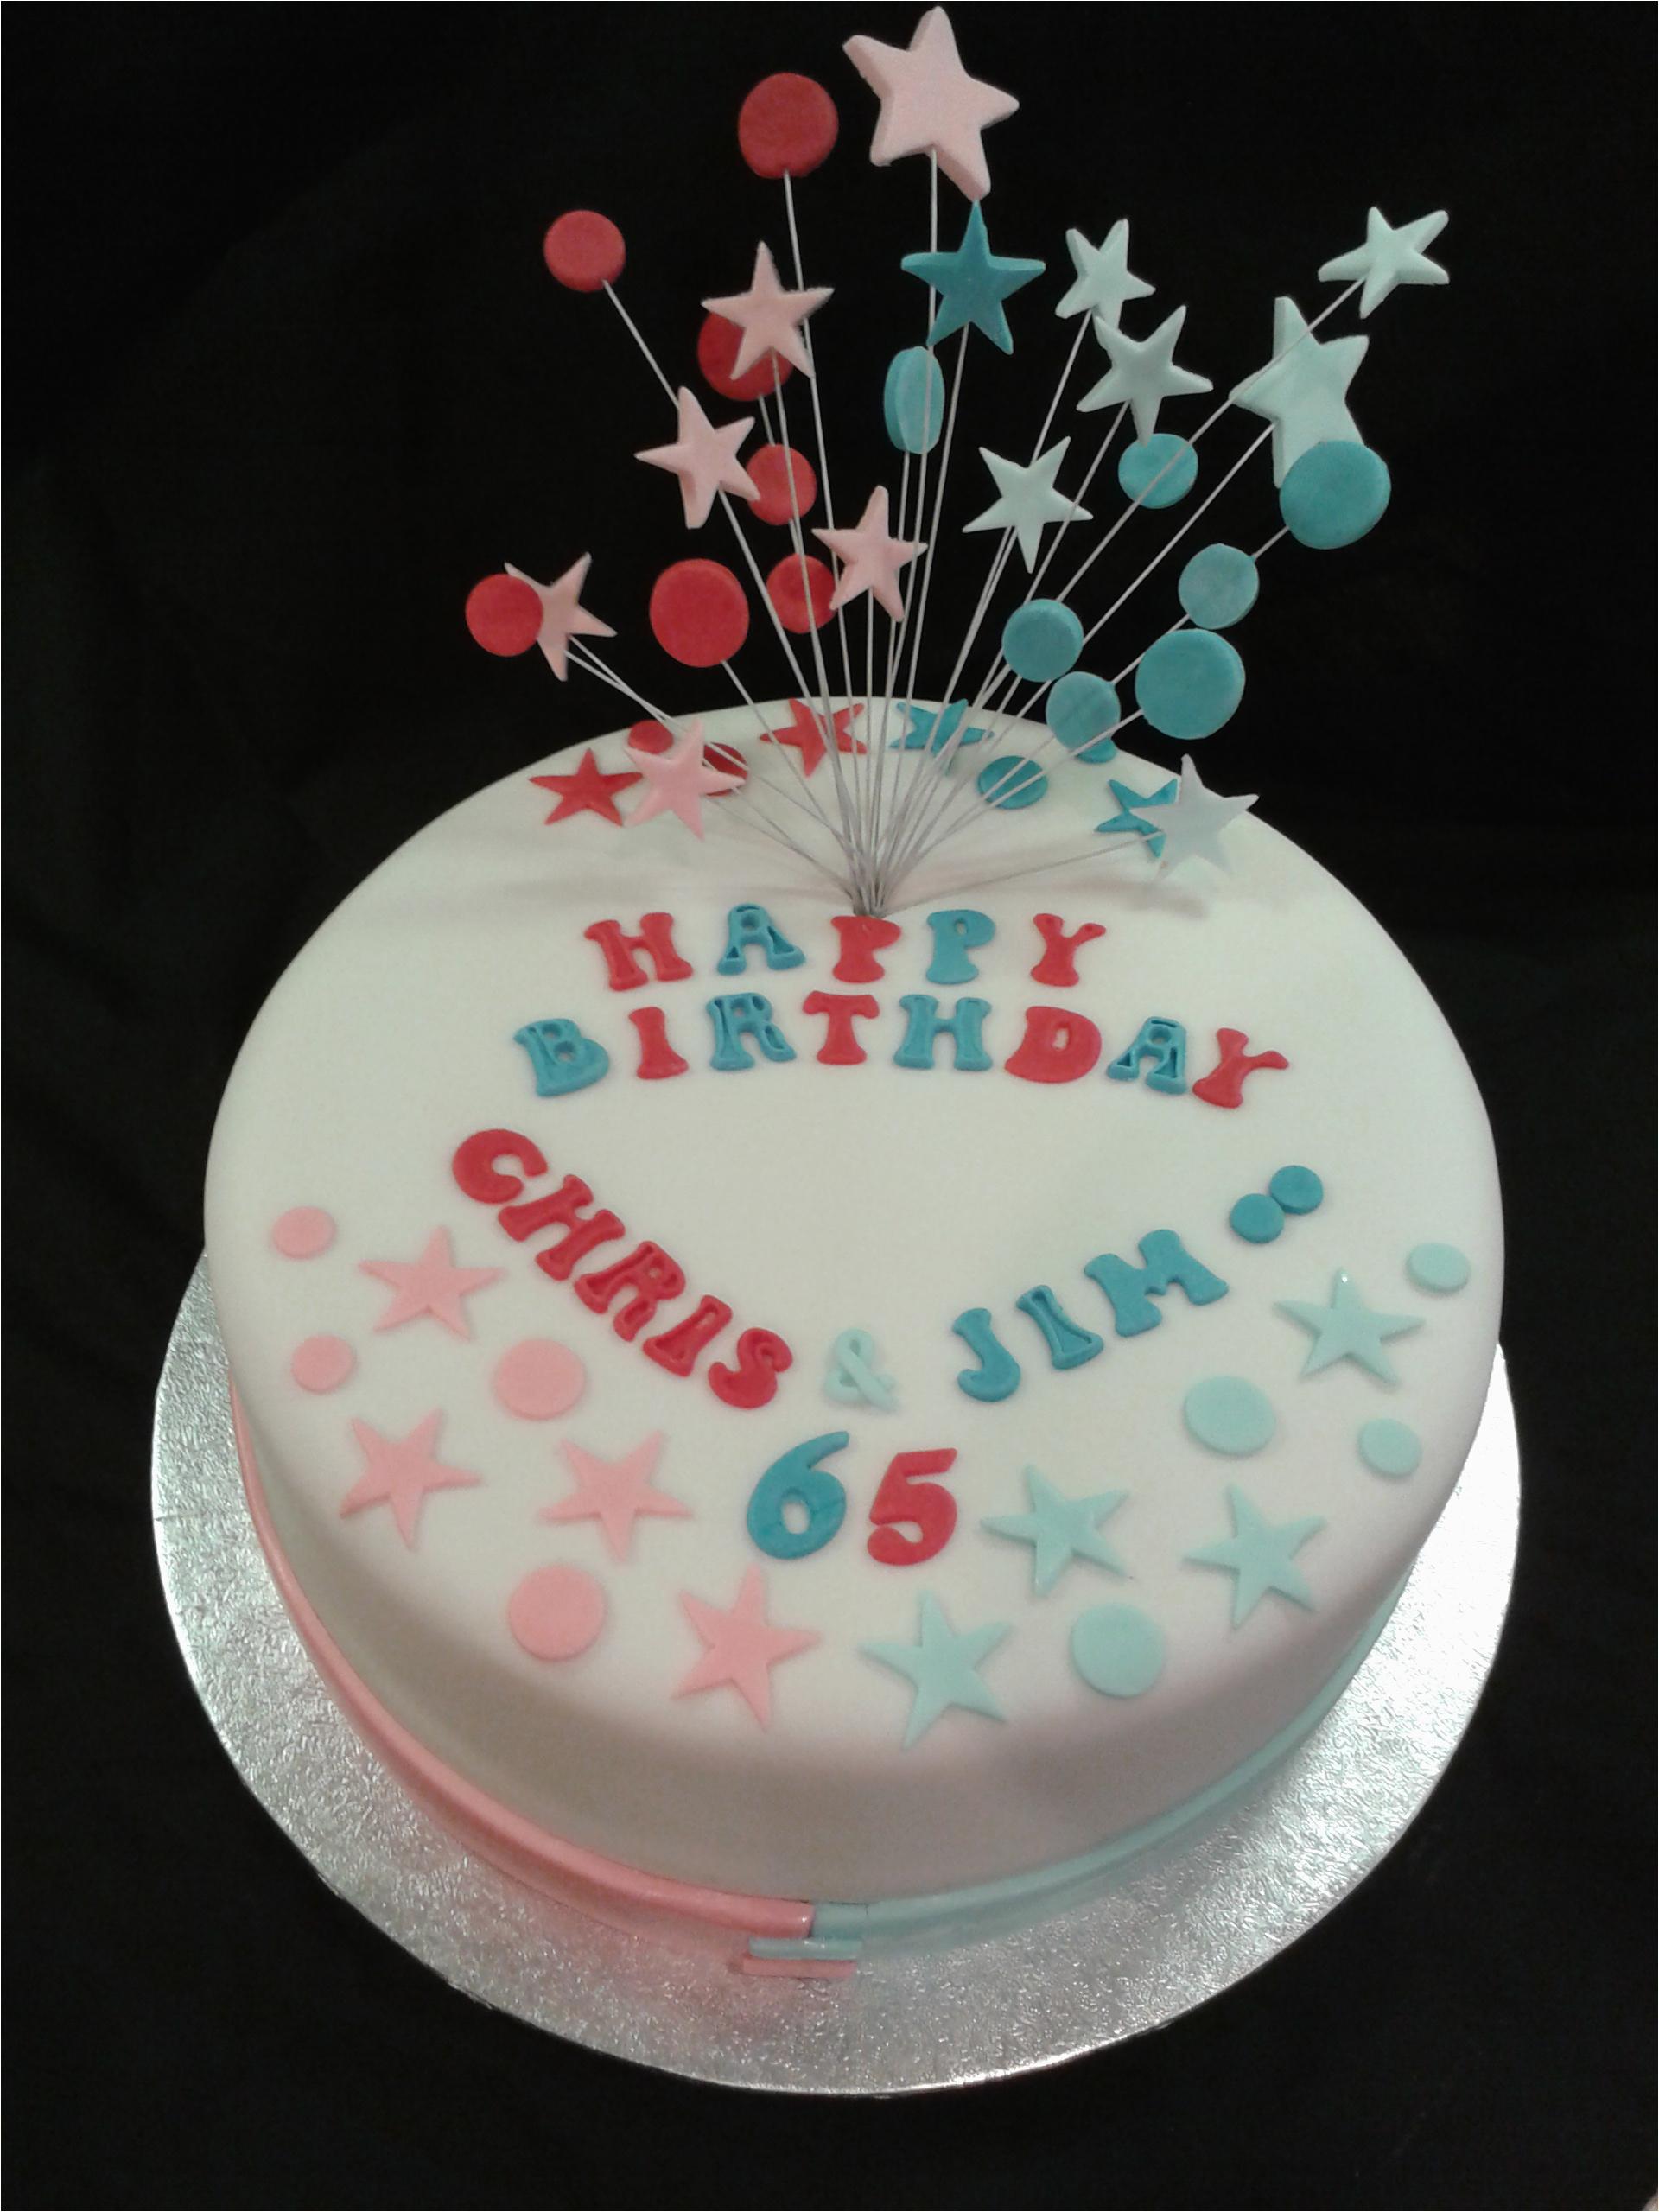 65th Birthday Decoration Ideas Party For Grandpa S Criolla